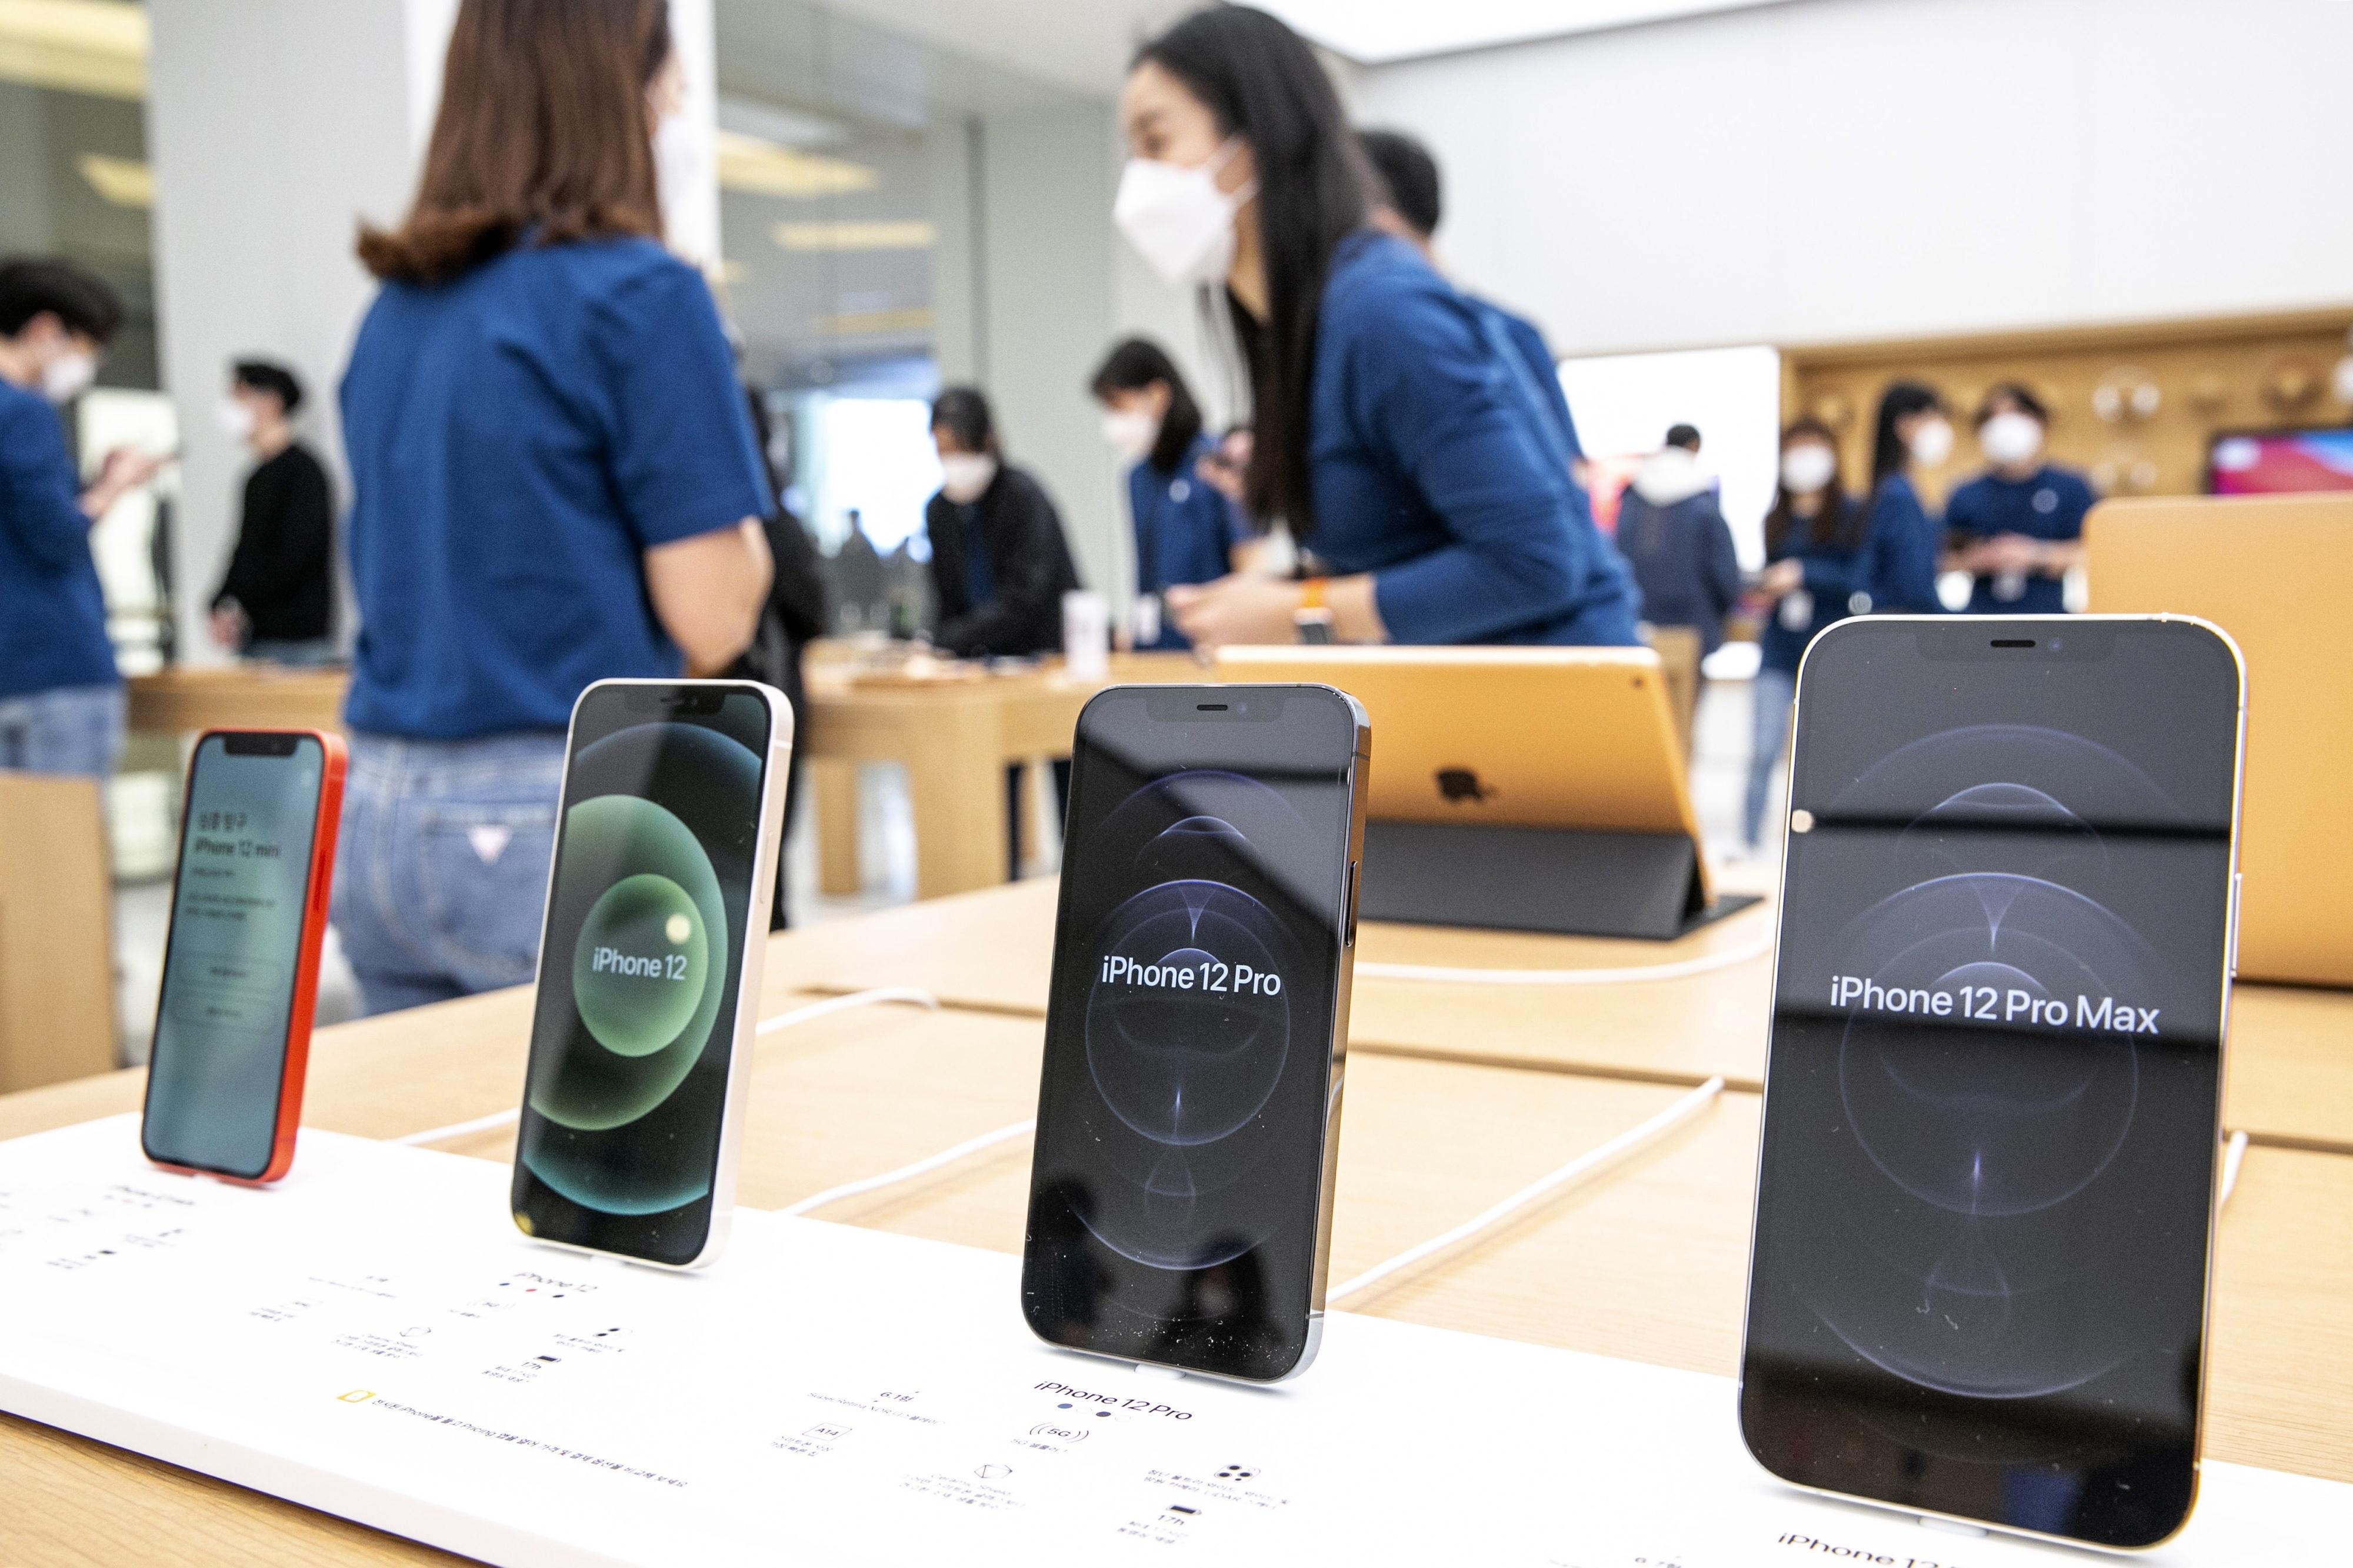 iPhone 11 Pro-এরও দাম কমছে। মিলবে ৭৯,৯০০ টাকায়।ফাইল ছবি : ব্লুমবার্গ (Bloomberg) (Bloomberg)